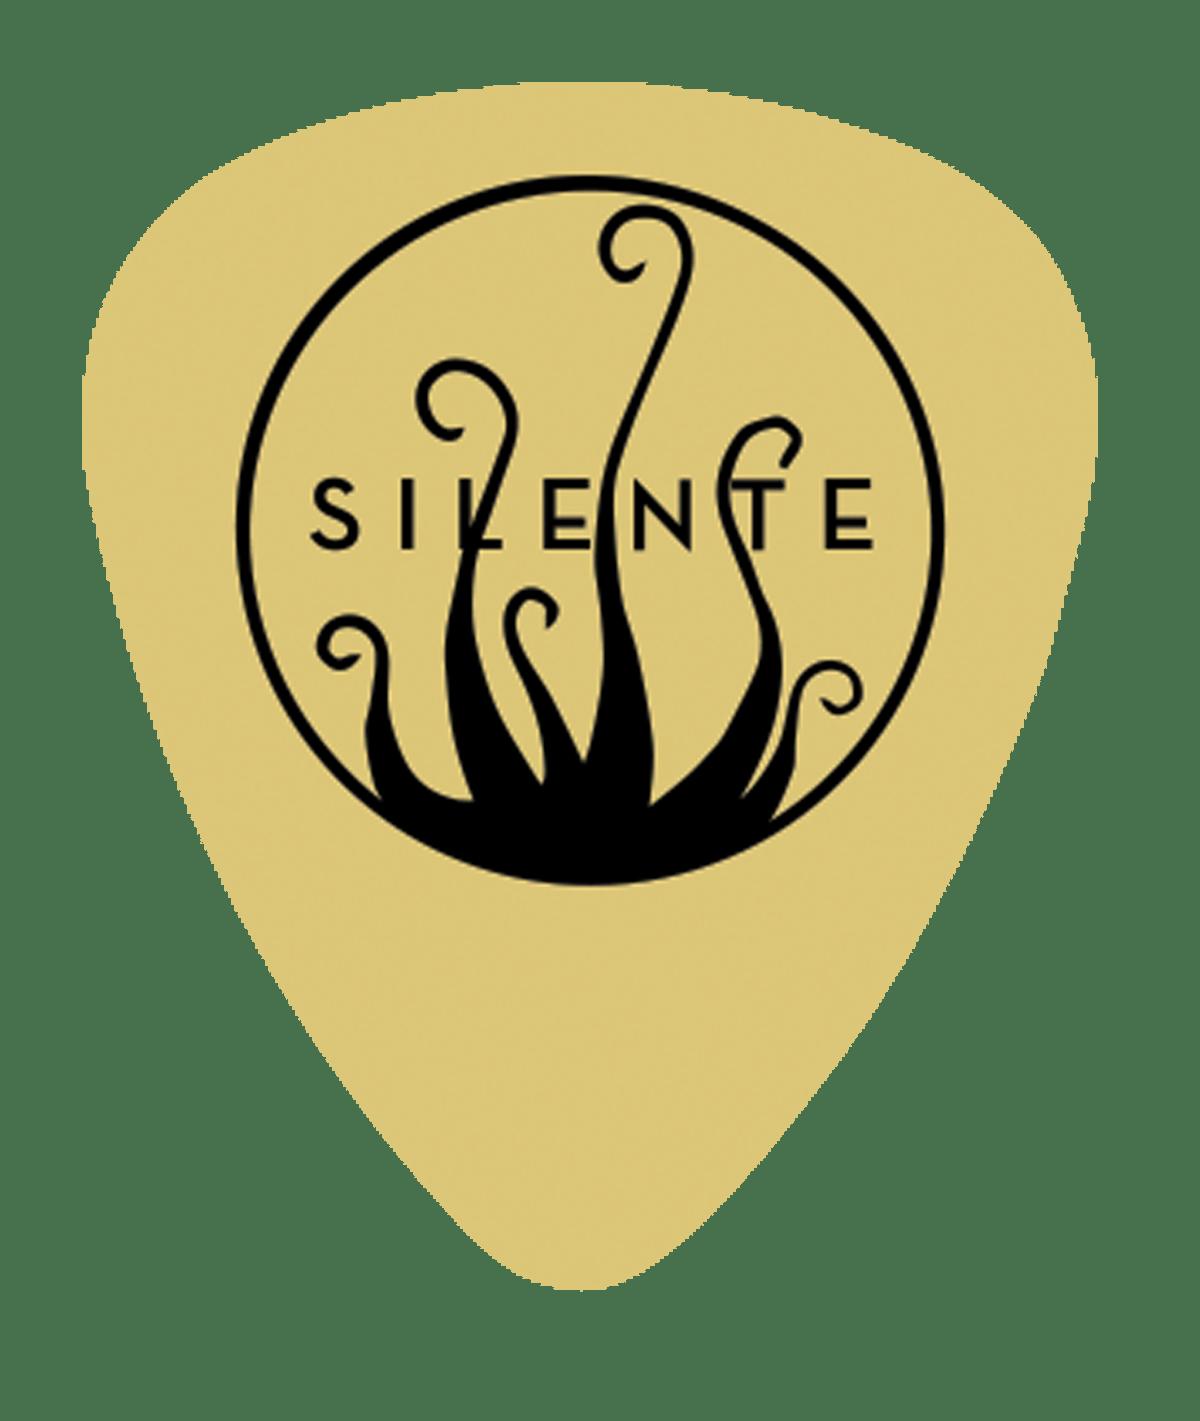 Image of Silente trzalice